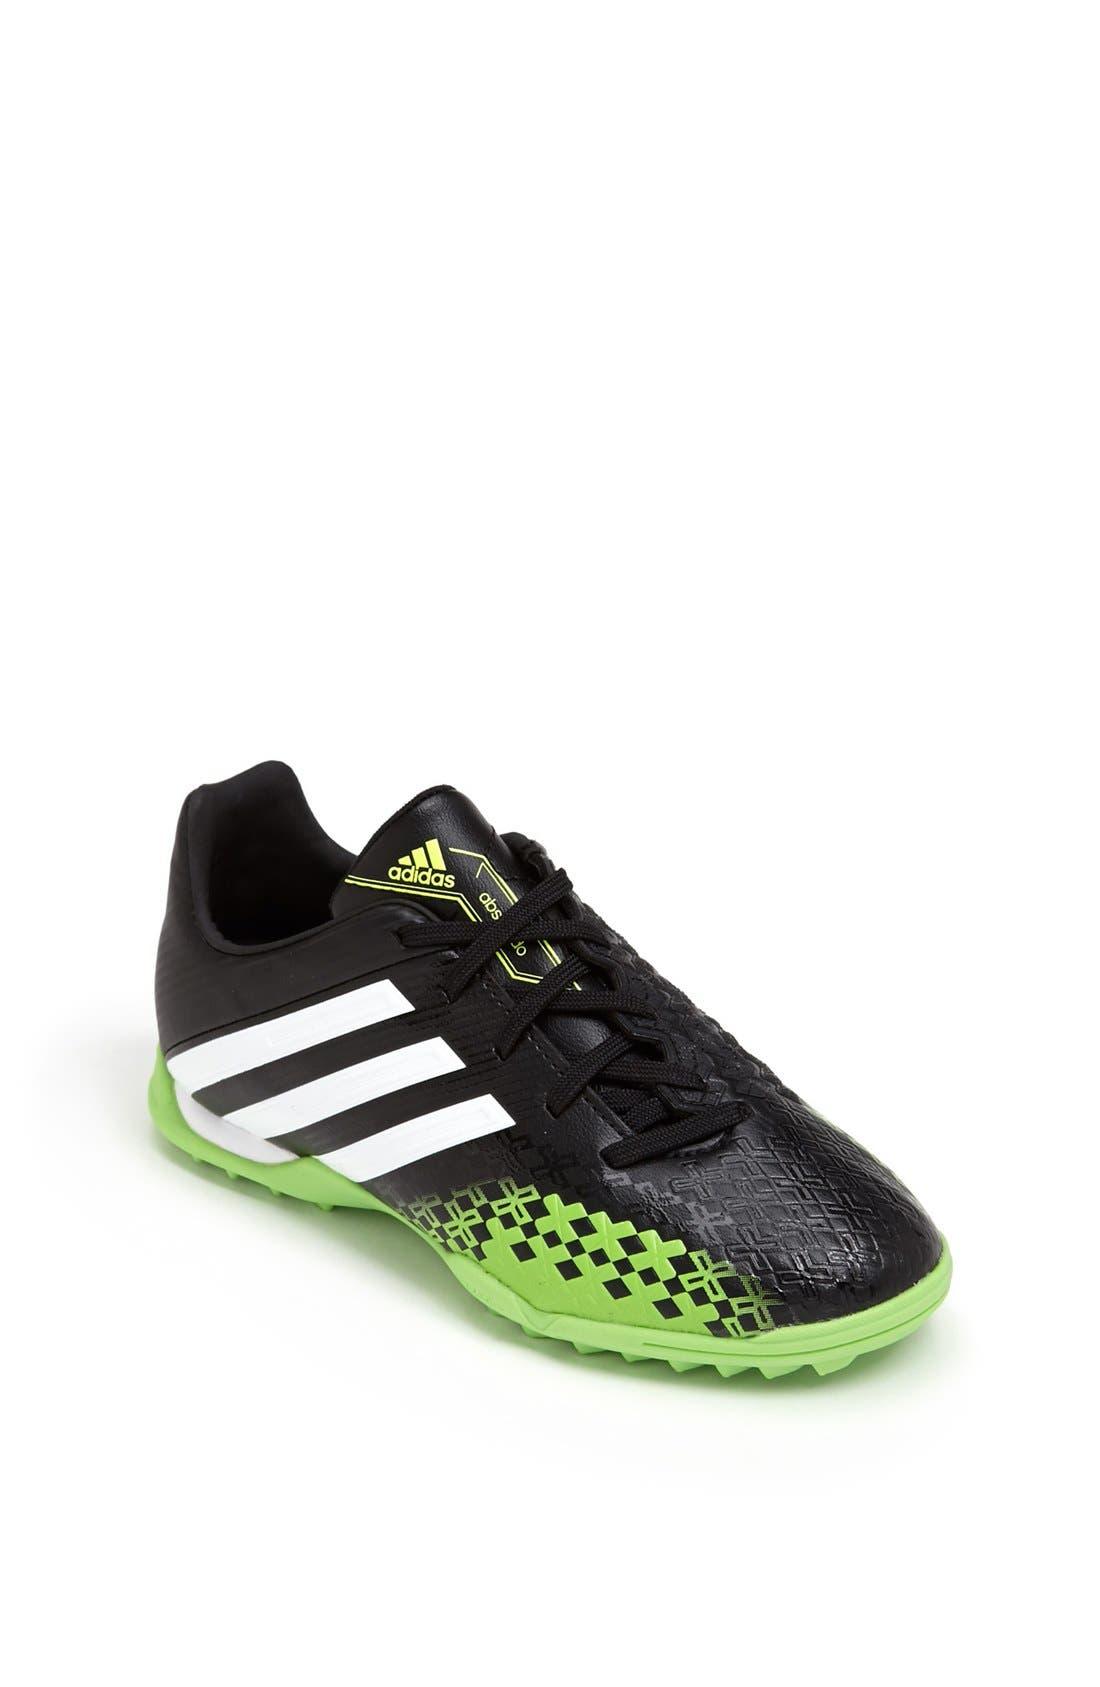 Alternate Image 1 Selected - adidas 'Predator Absolado LZ TRX TF' Soccer Shoe (Toddler, Little Kid & Big Kid)